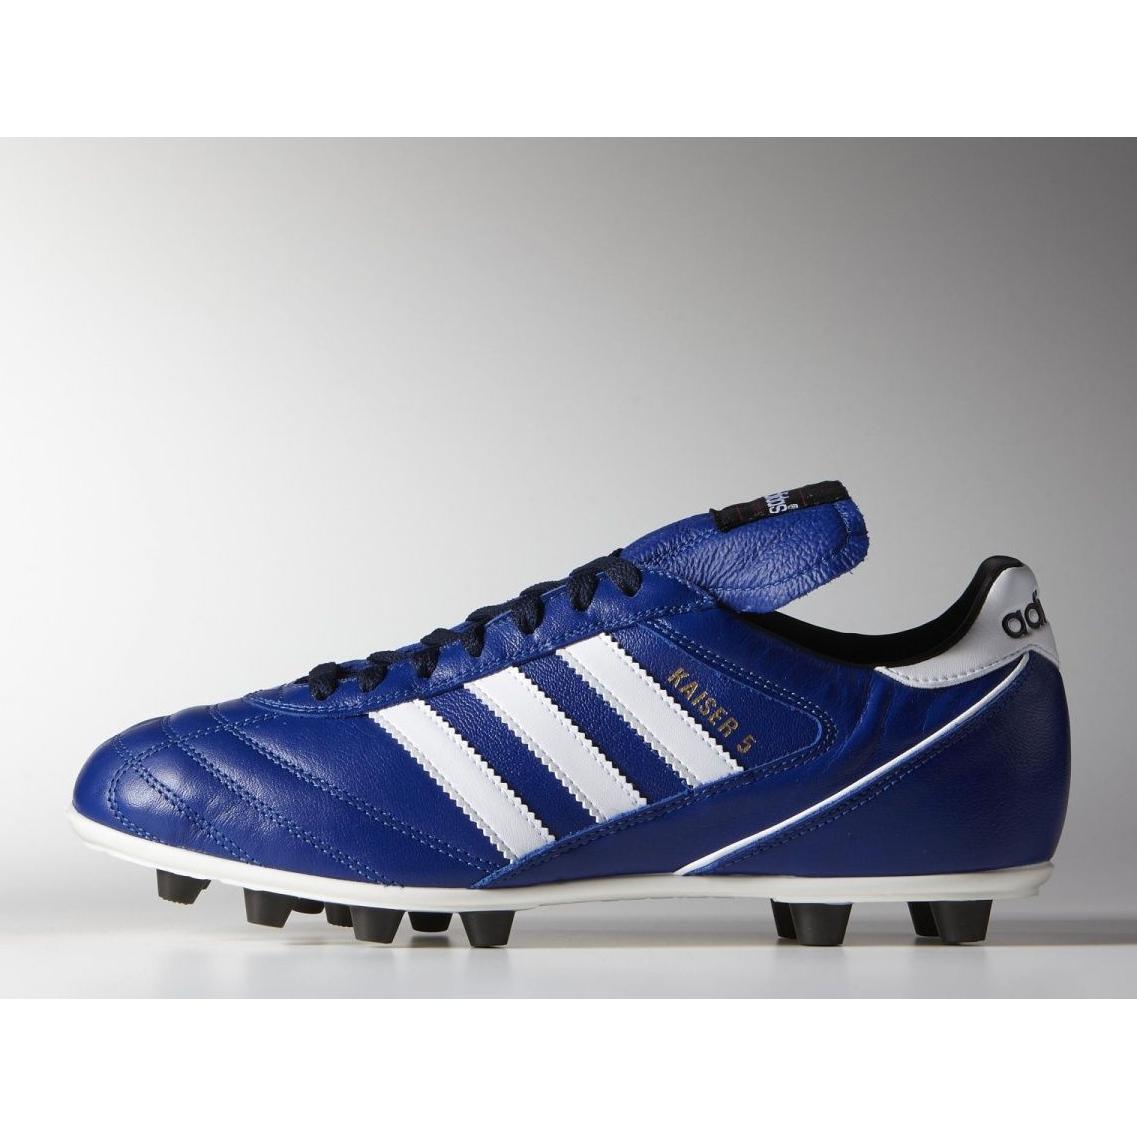 Details about Football boots adidas Kaiser 5 Liga Fg M B34253 blue blue